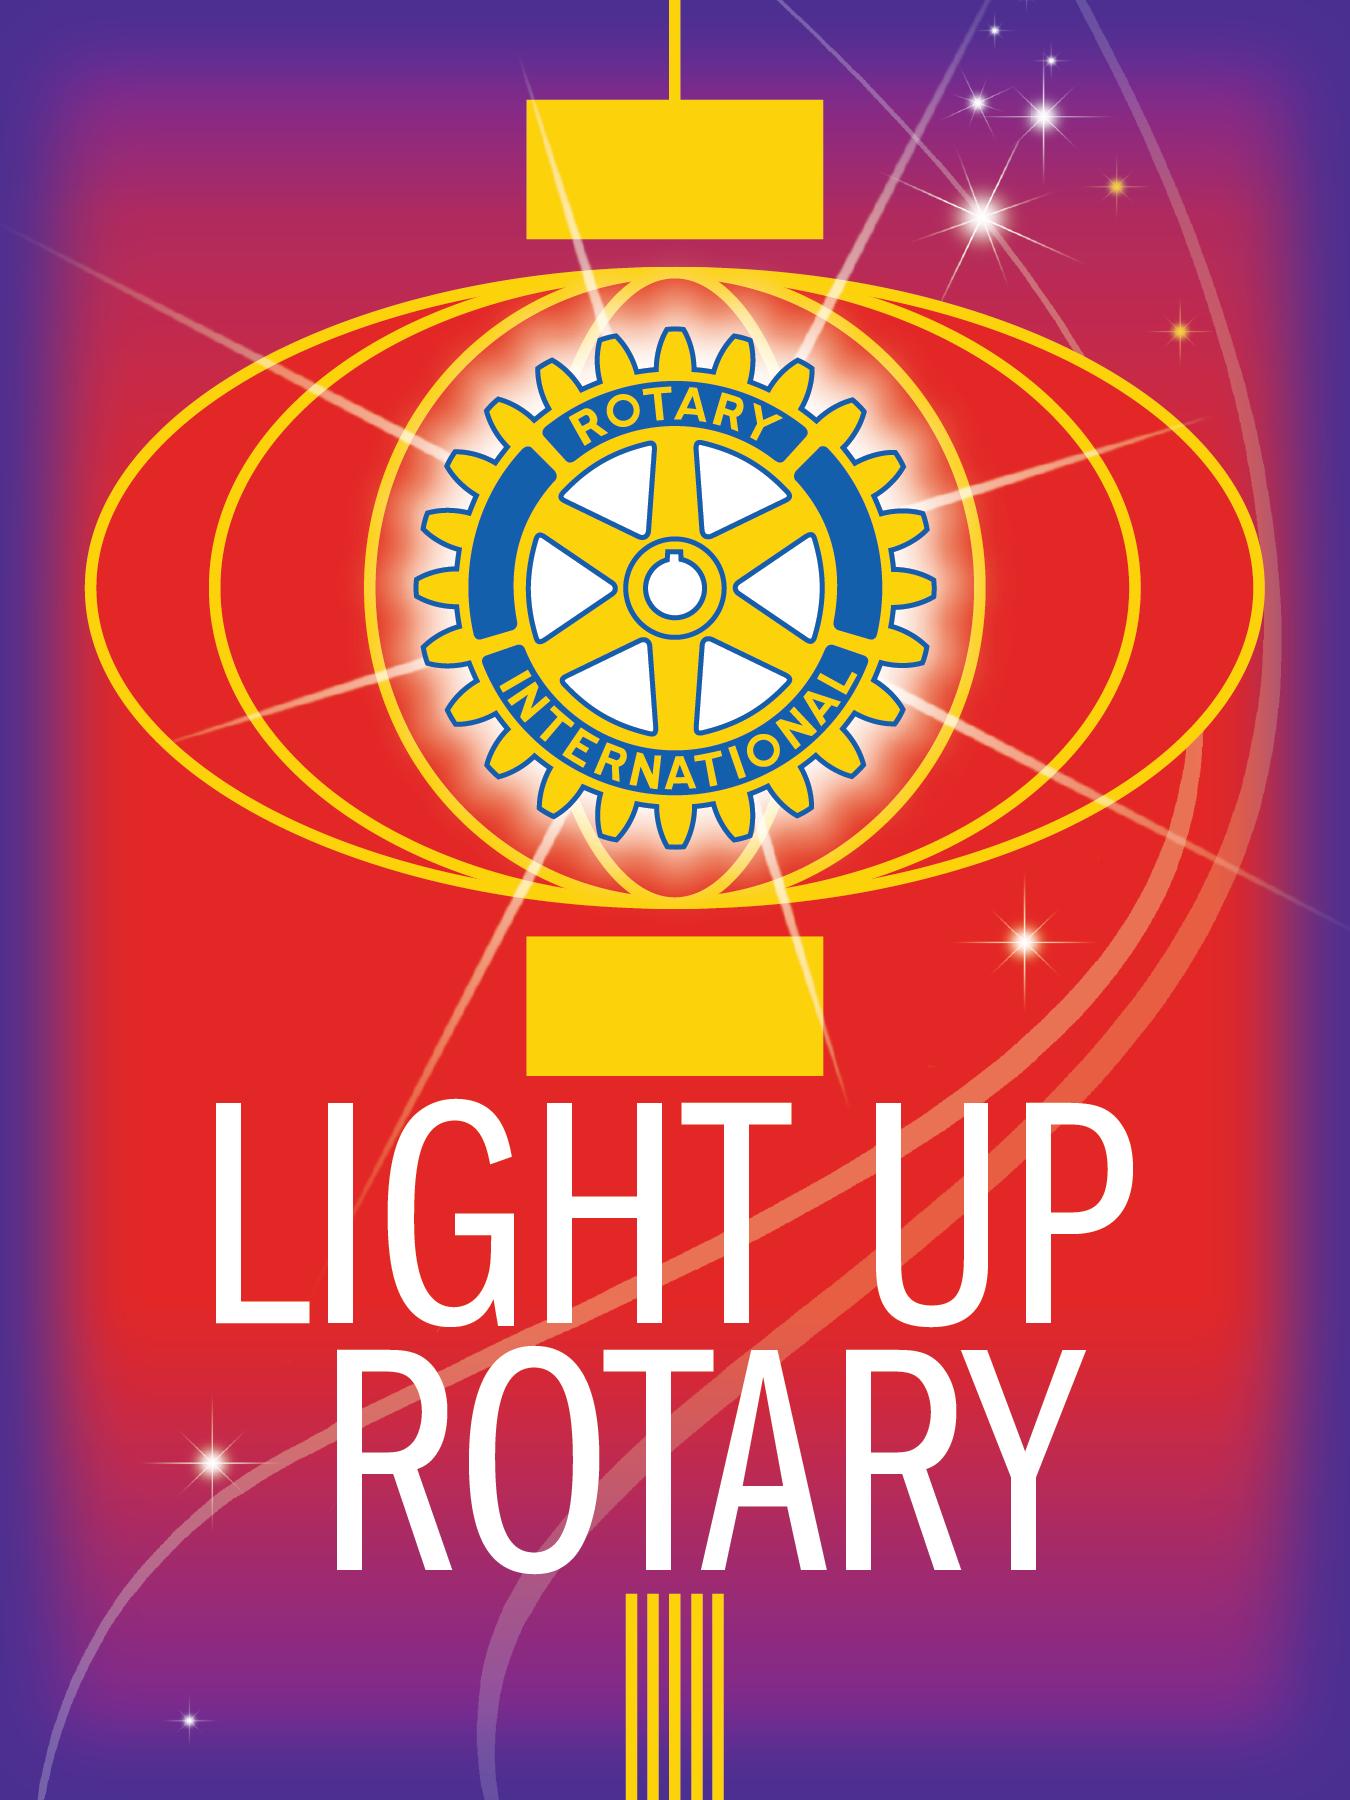 Rotary 2014